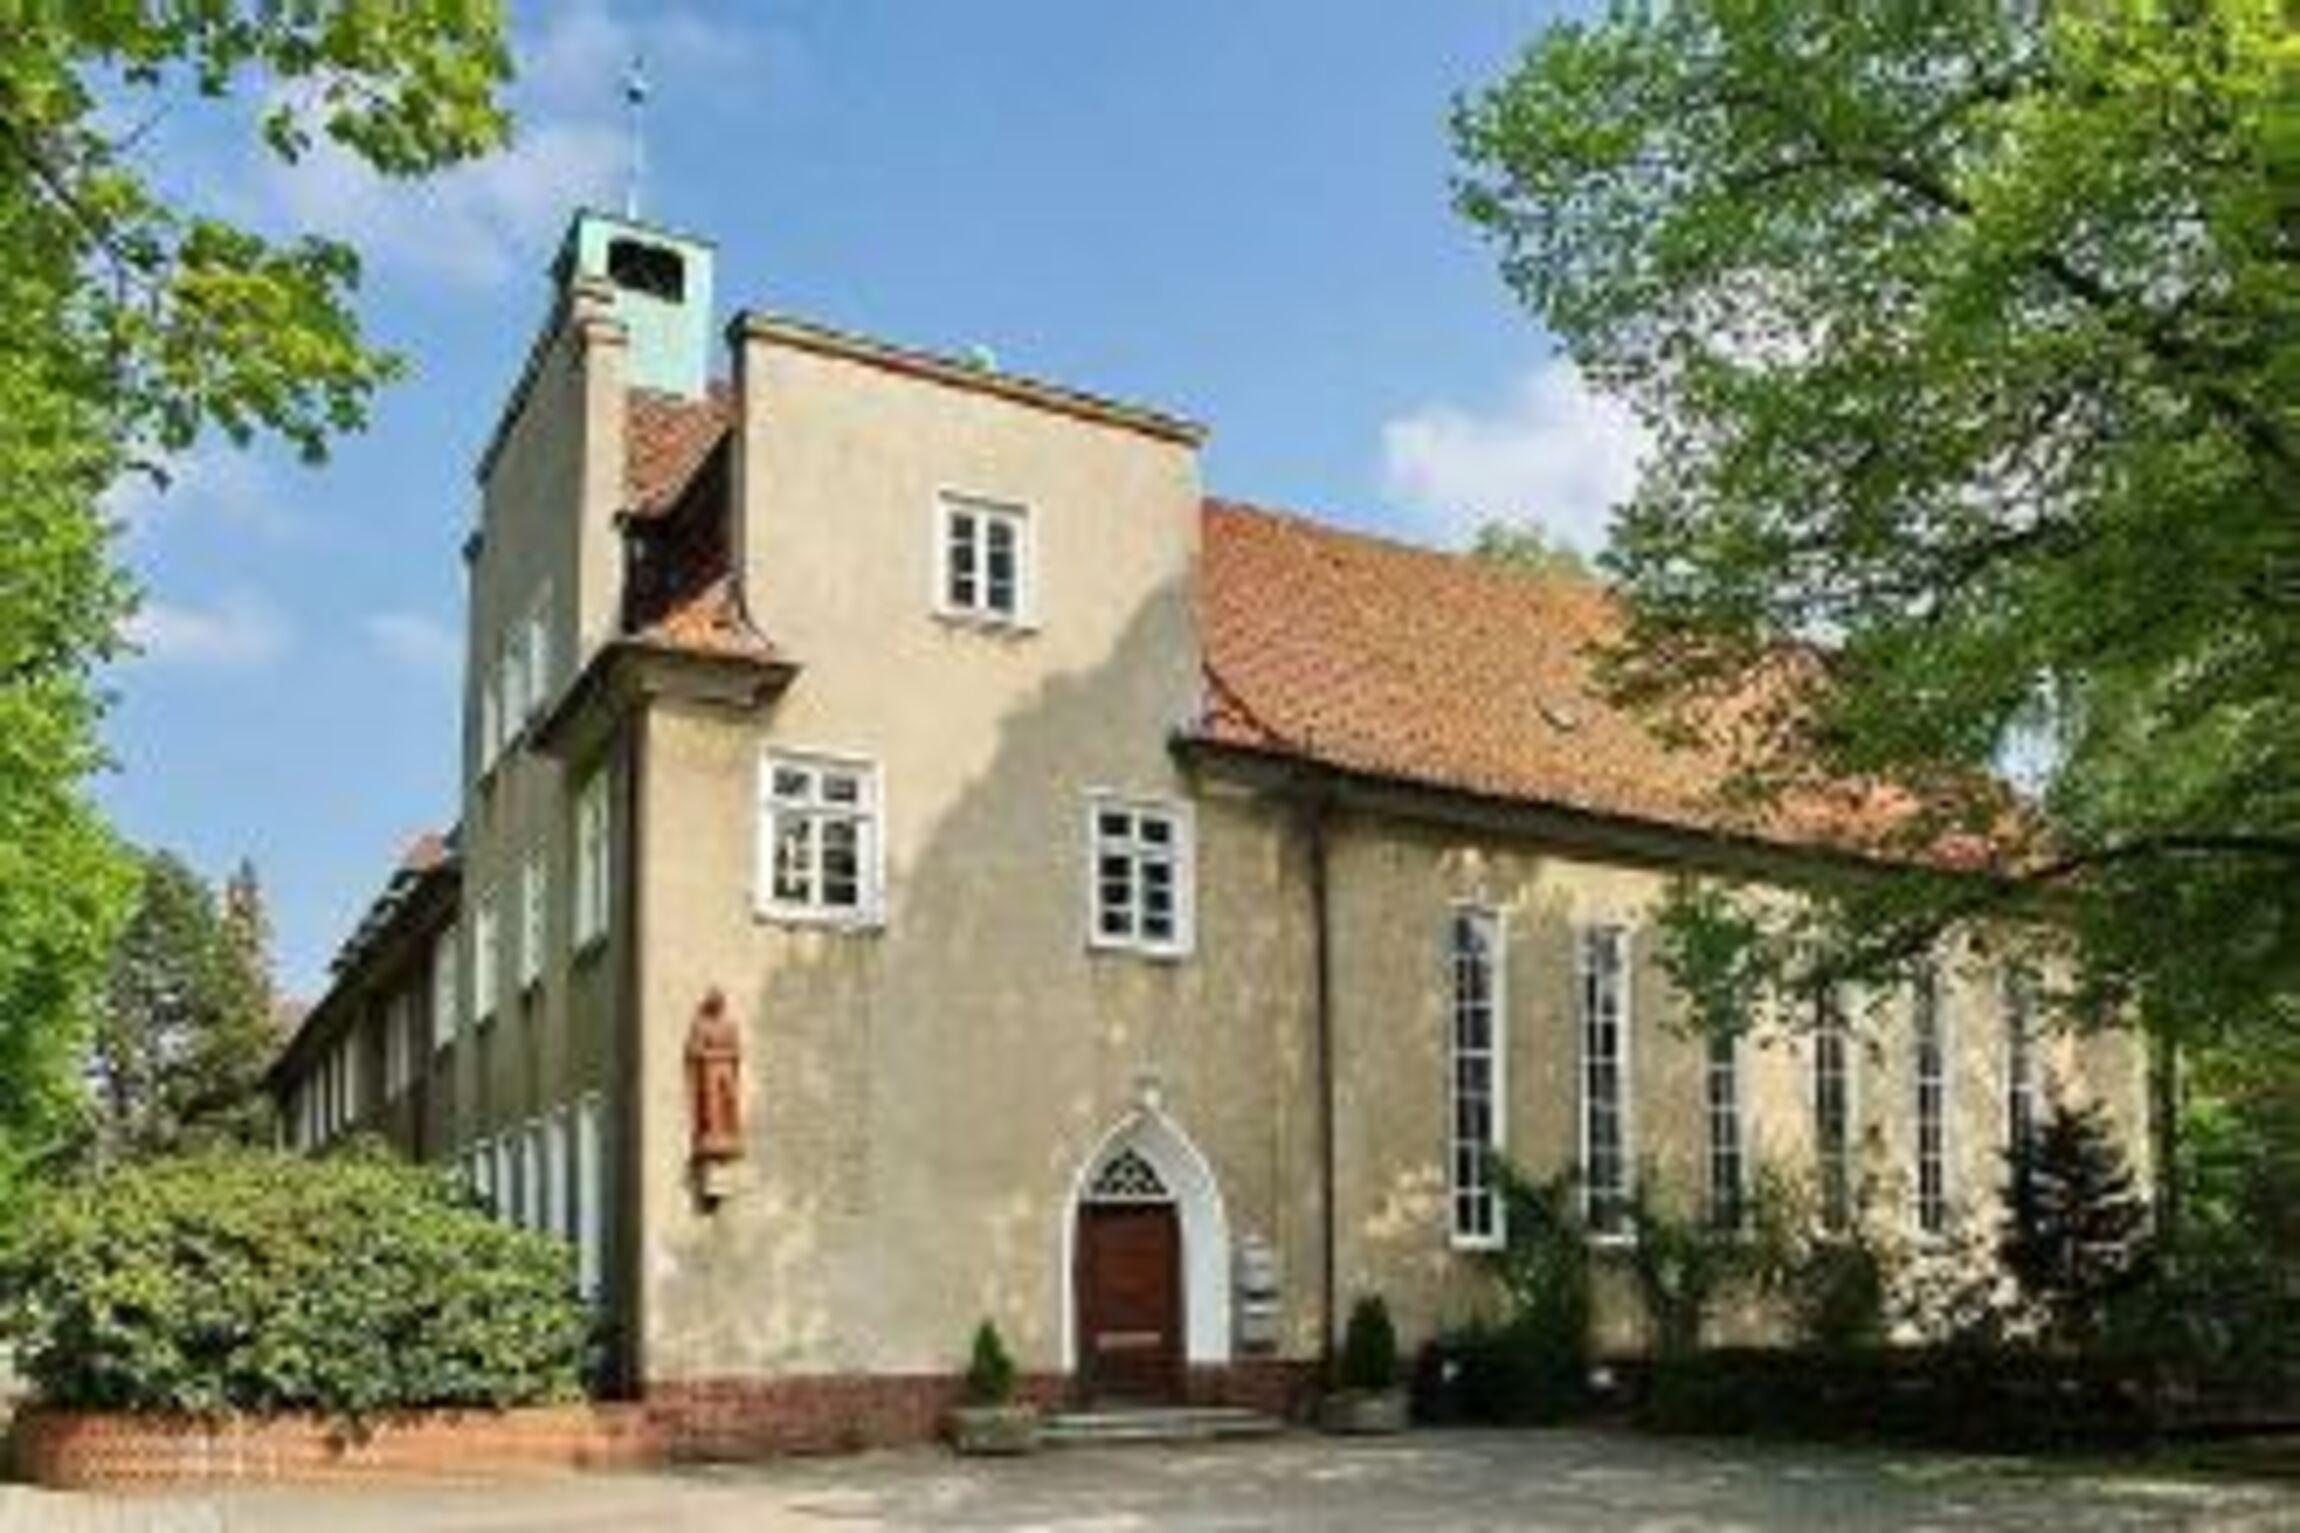 Friedenskirche